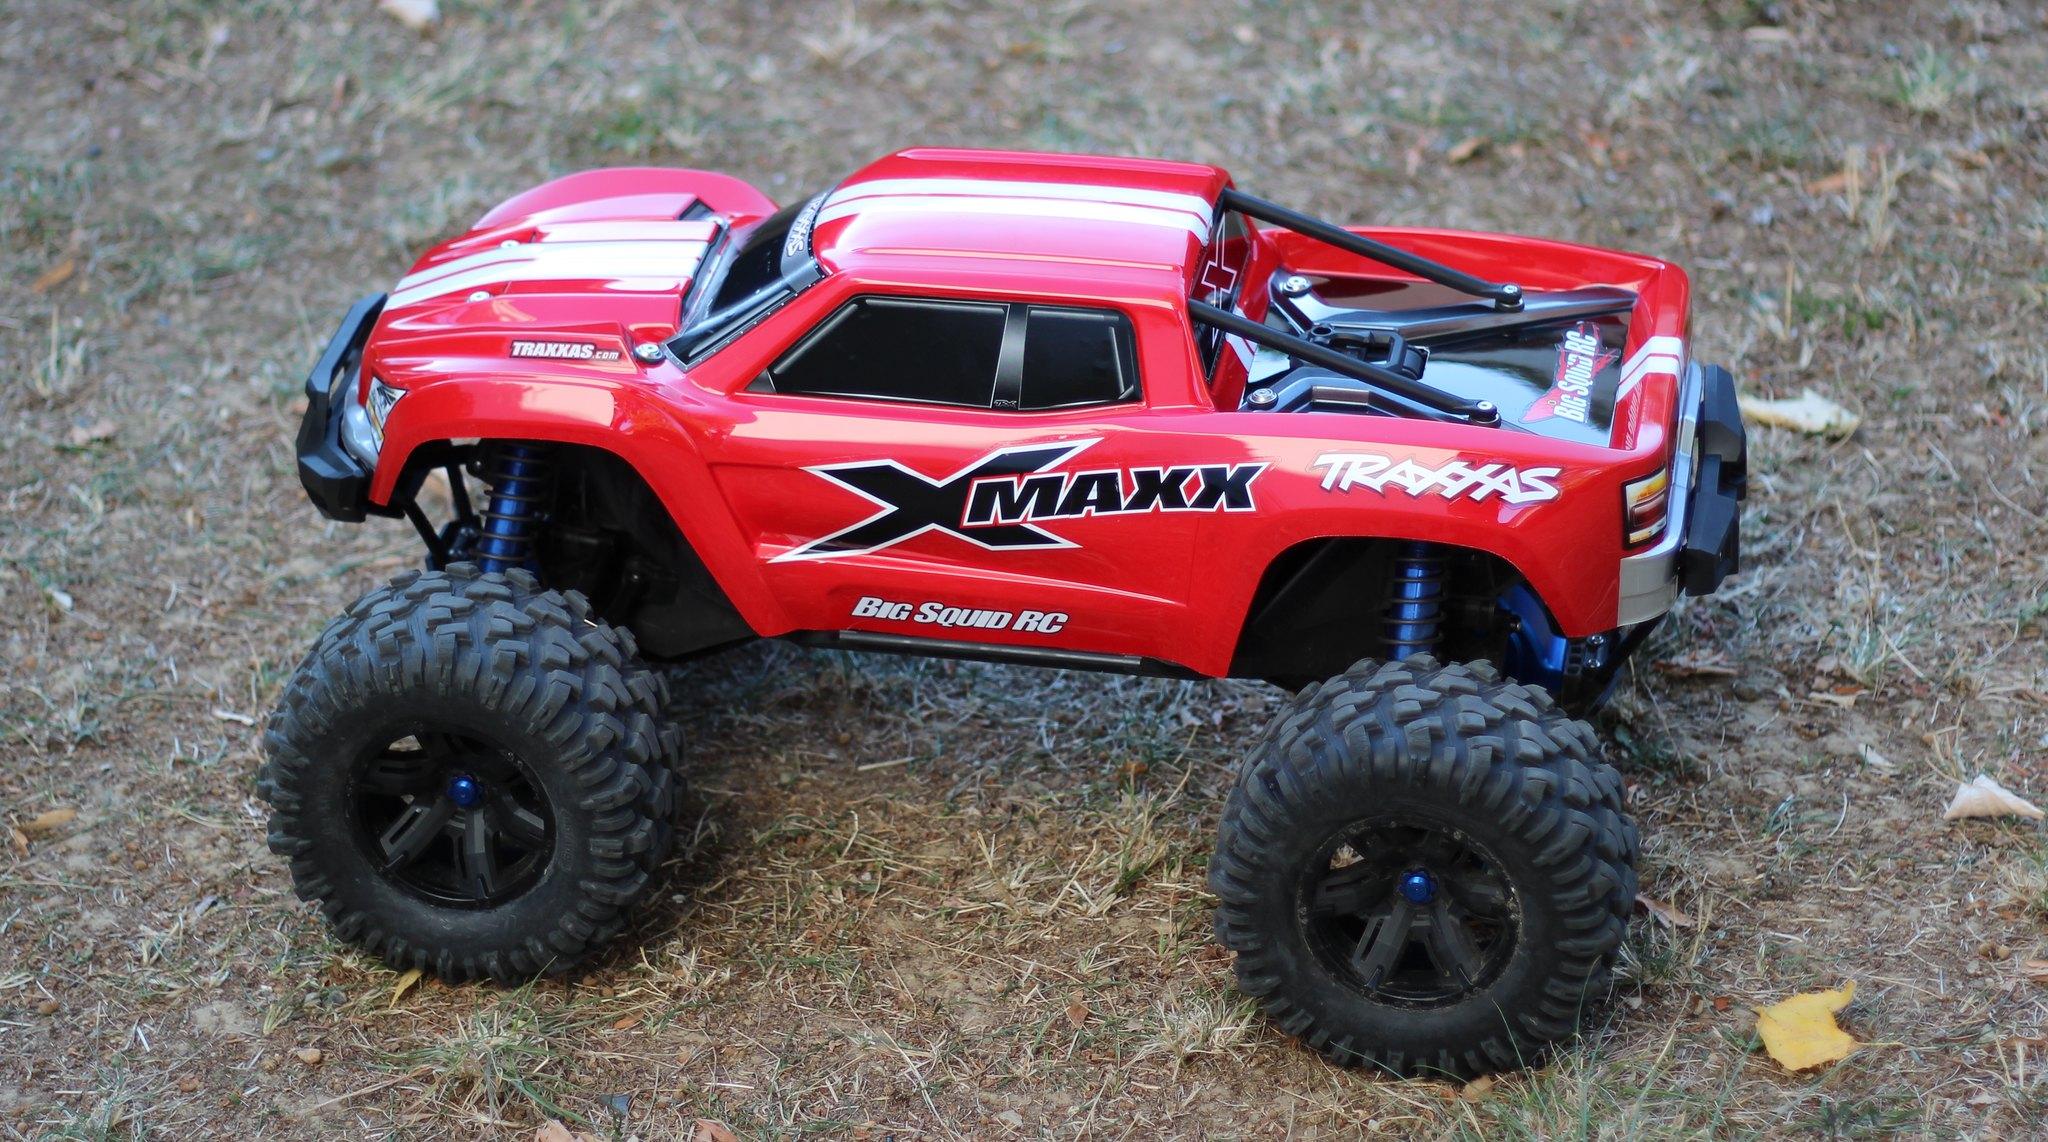 X-Maxx de Ducla (relooking) 29911928932_d7ea654a4c_k